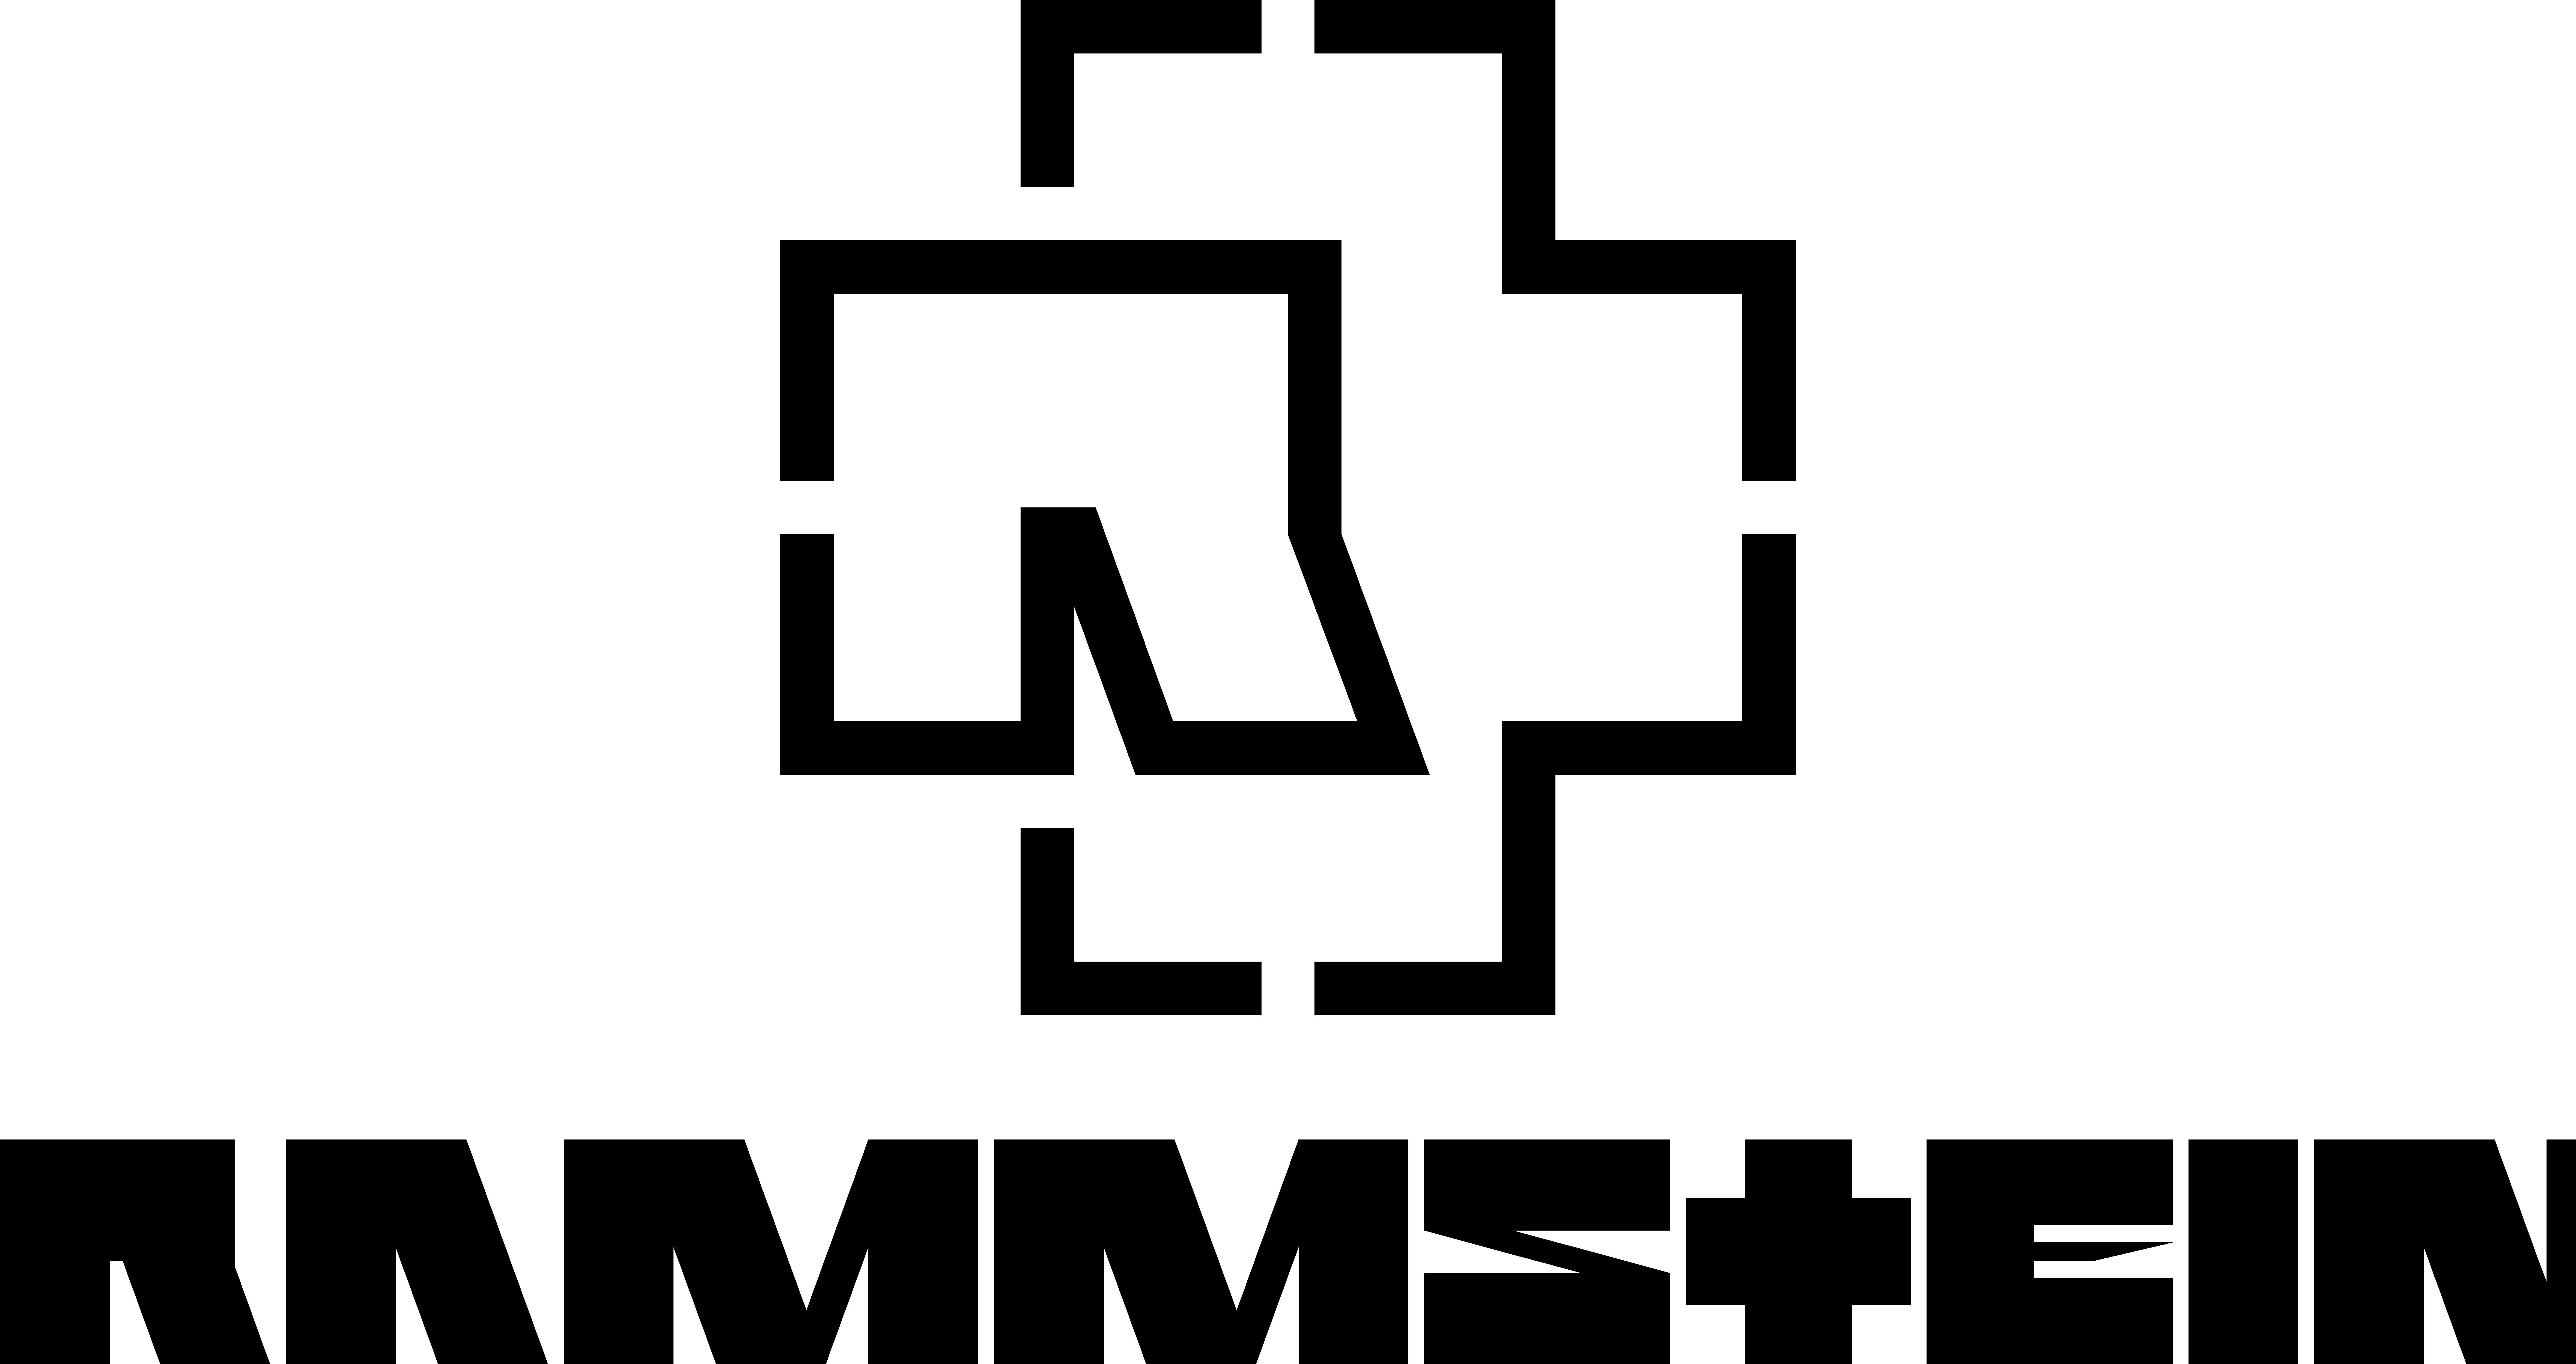 Rammstein Wikipedia